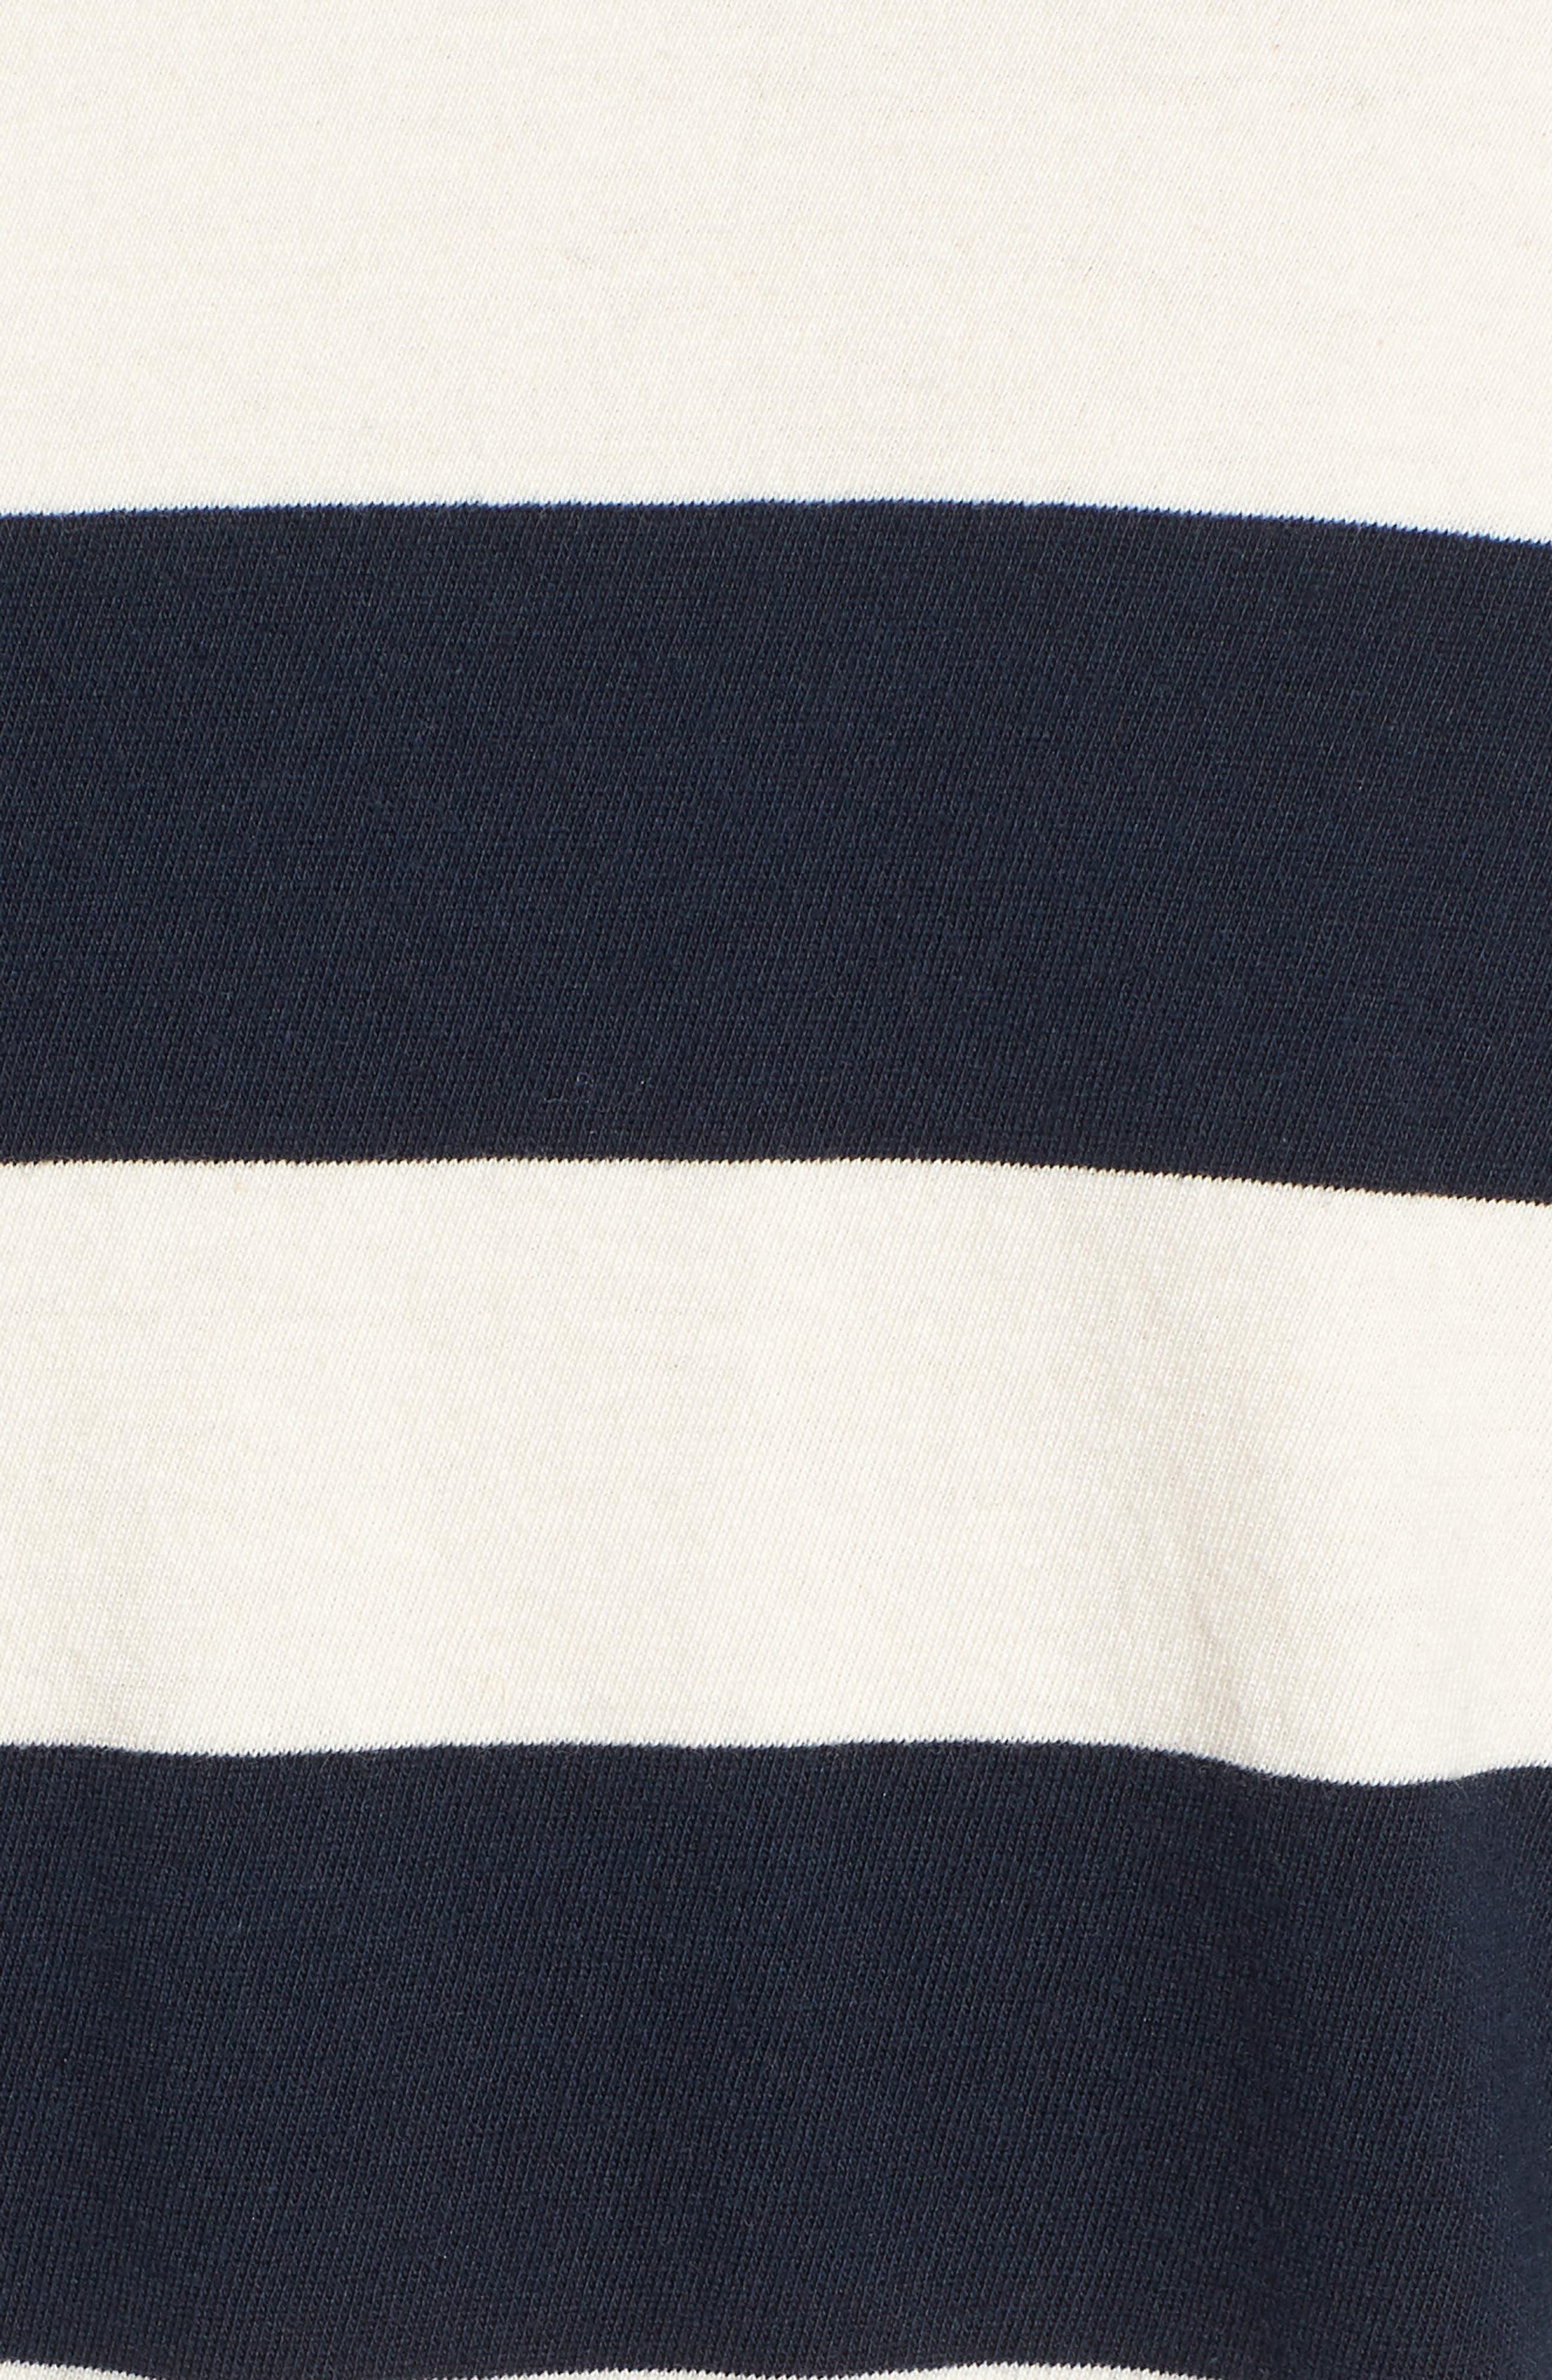 Stripe Twist Tee,                             Alternate thumbnail 5, color,                             900